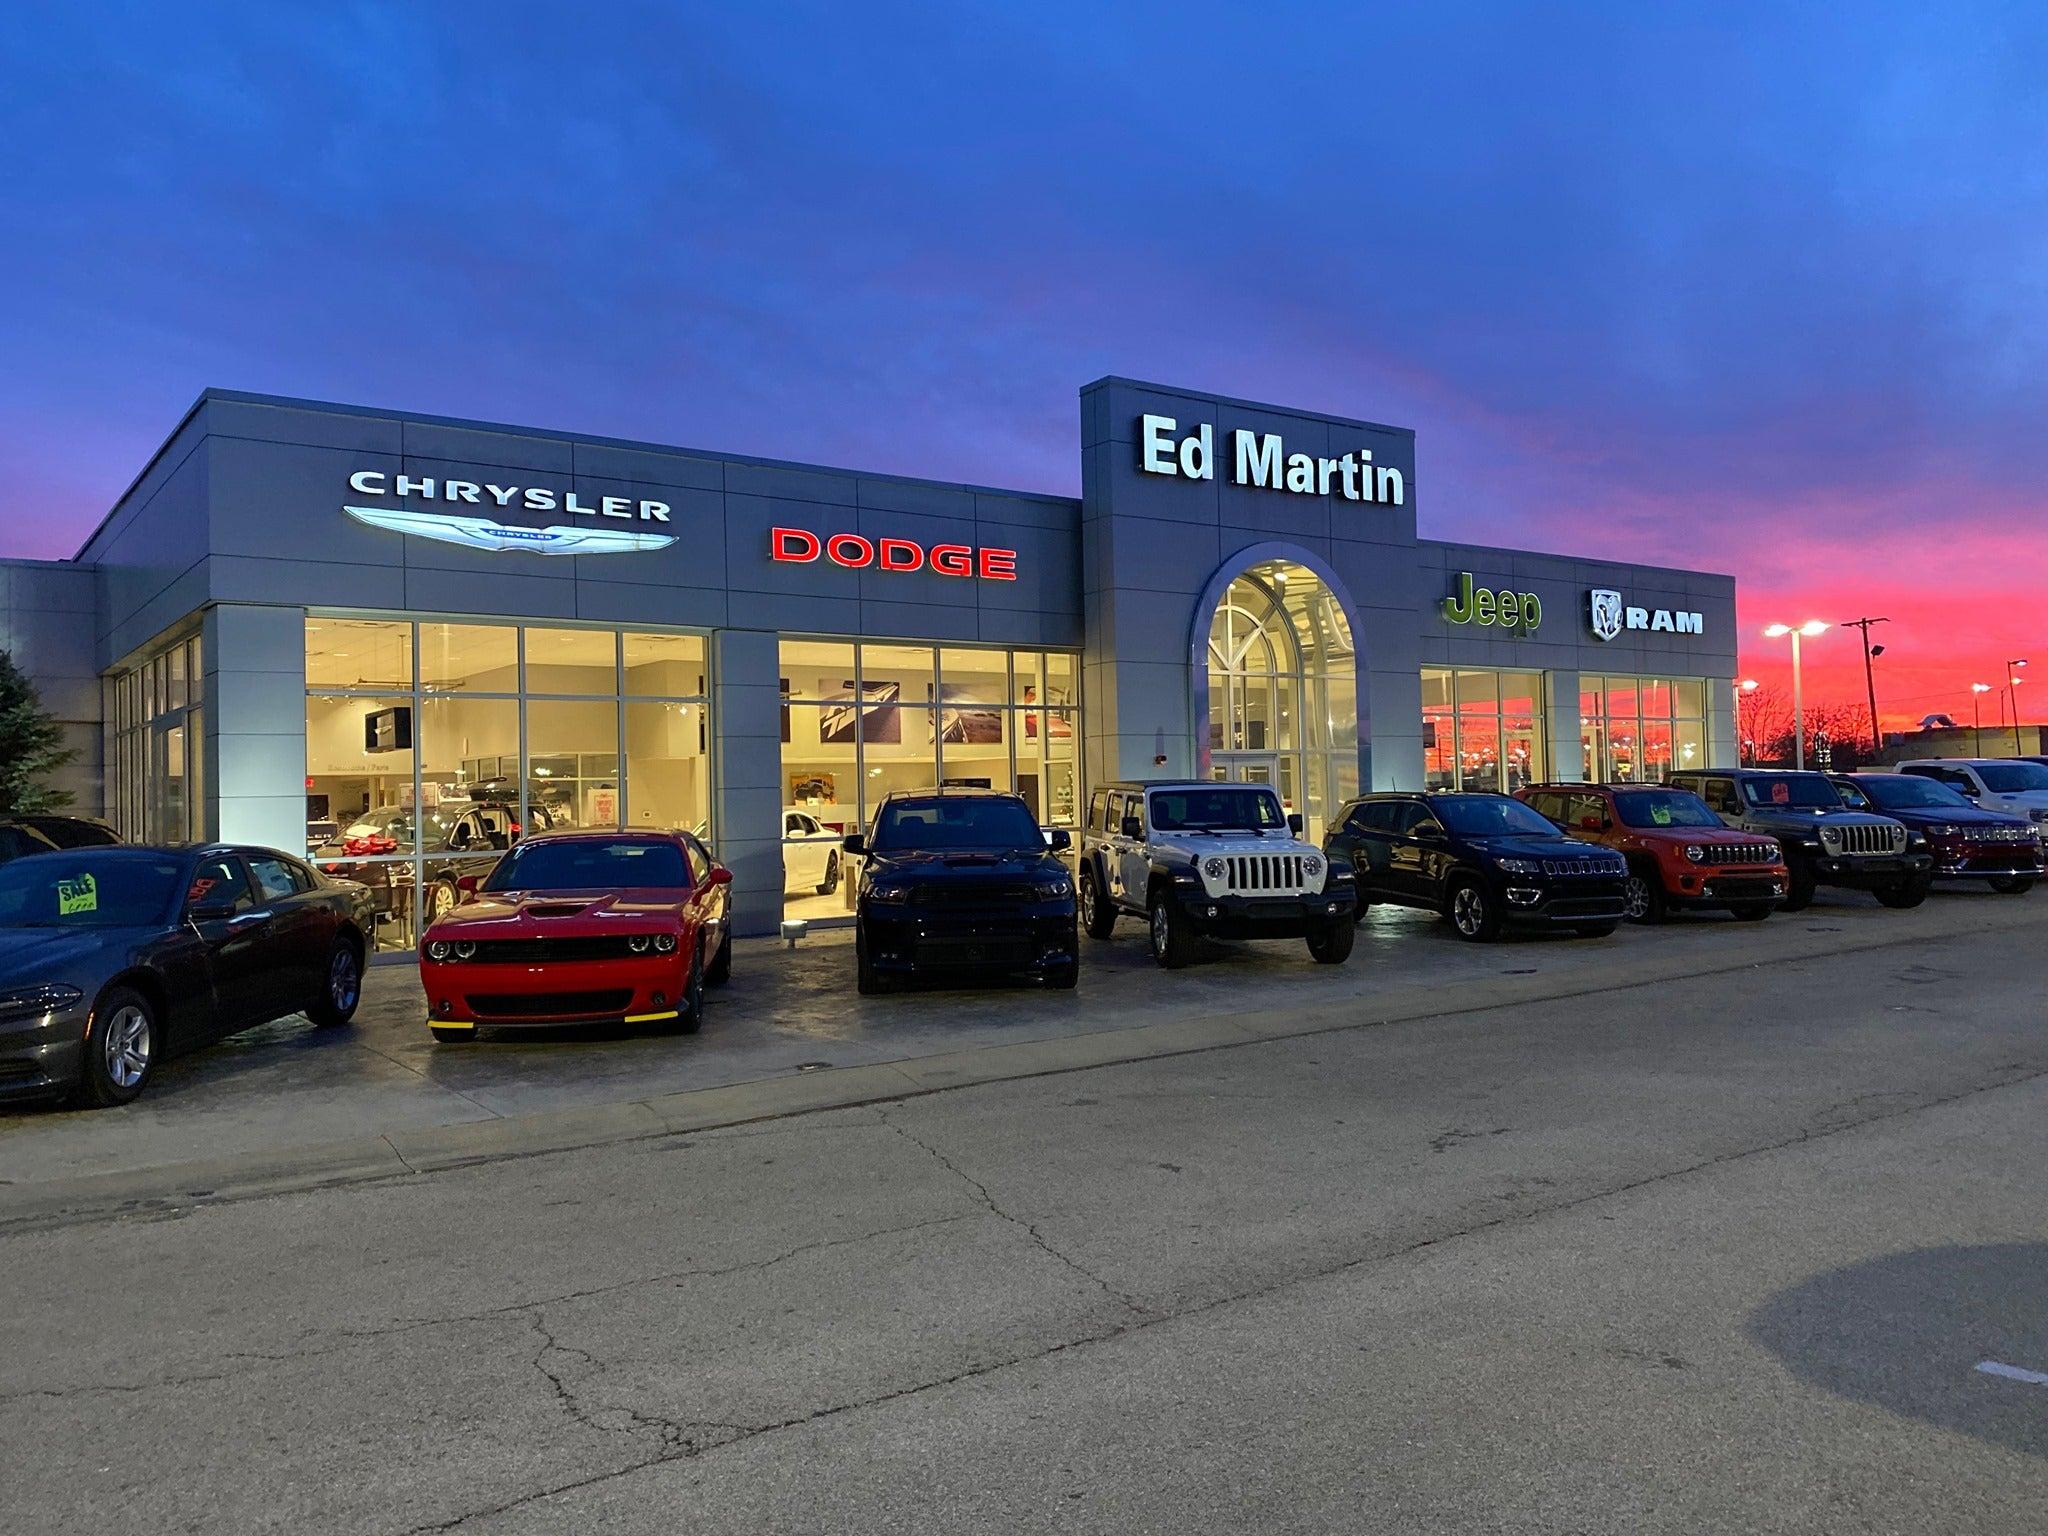 dodge dealership indiana Chrysler Dodge Jeep Ram Dealership  Used Cars Anderson, IN  Ed